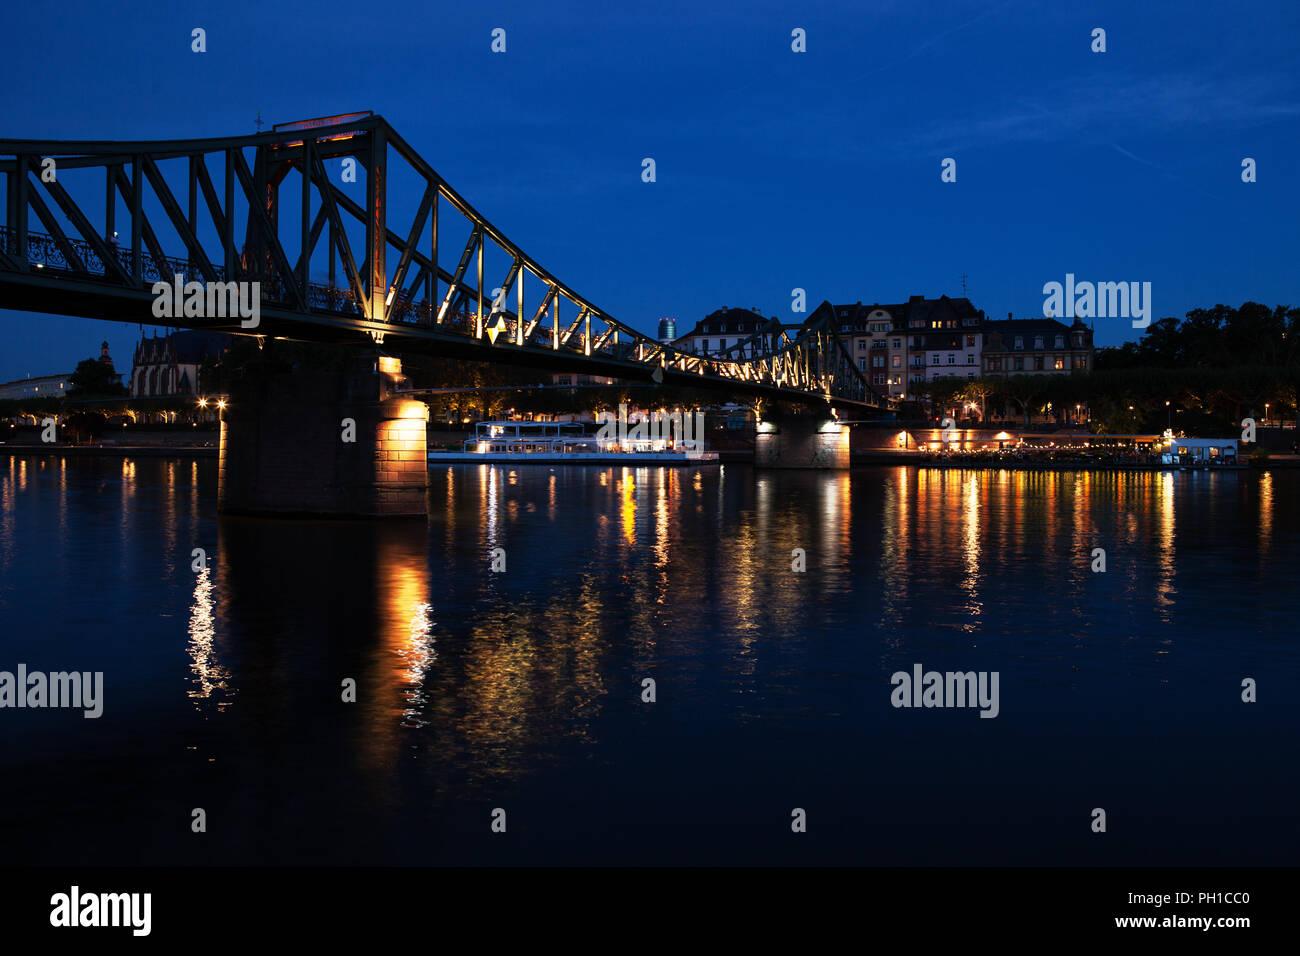 Europa Germany Hessen Rhein-Main Frankfurt am Main Eiserner Steg bei Nacht - Stock Image